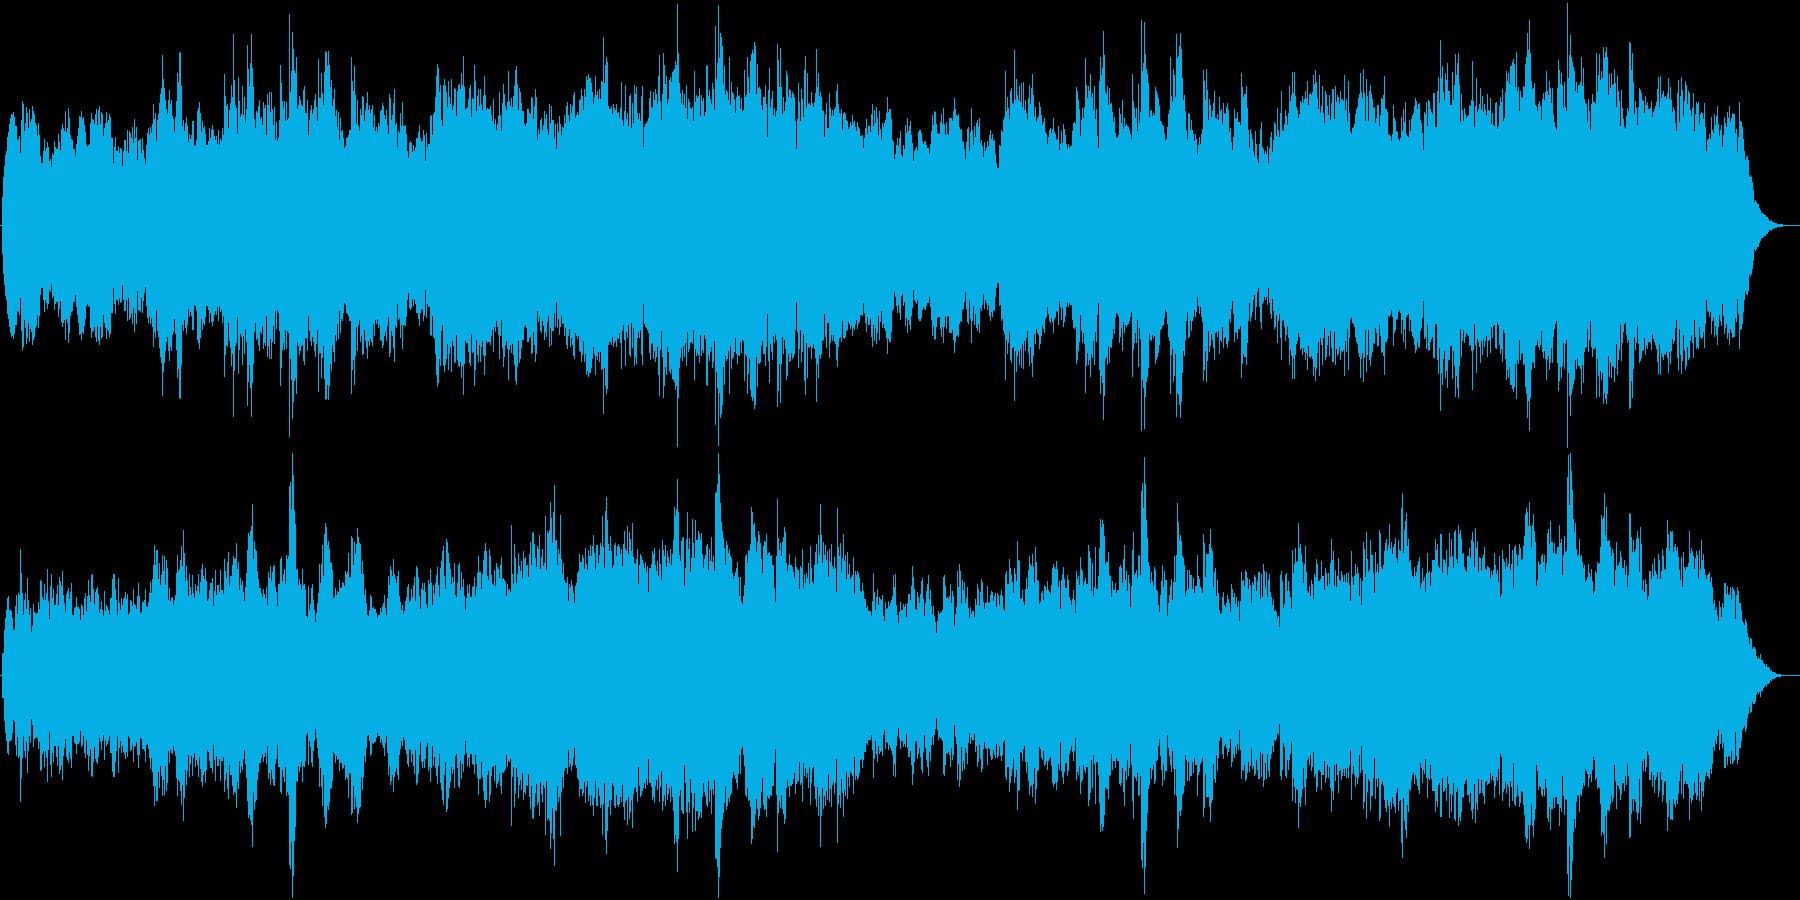 RPG向け神秘的な海底ステージBGMの再生済みの波形